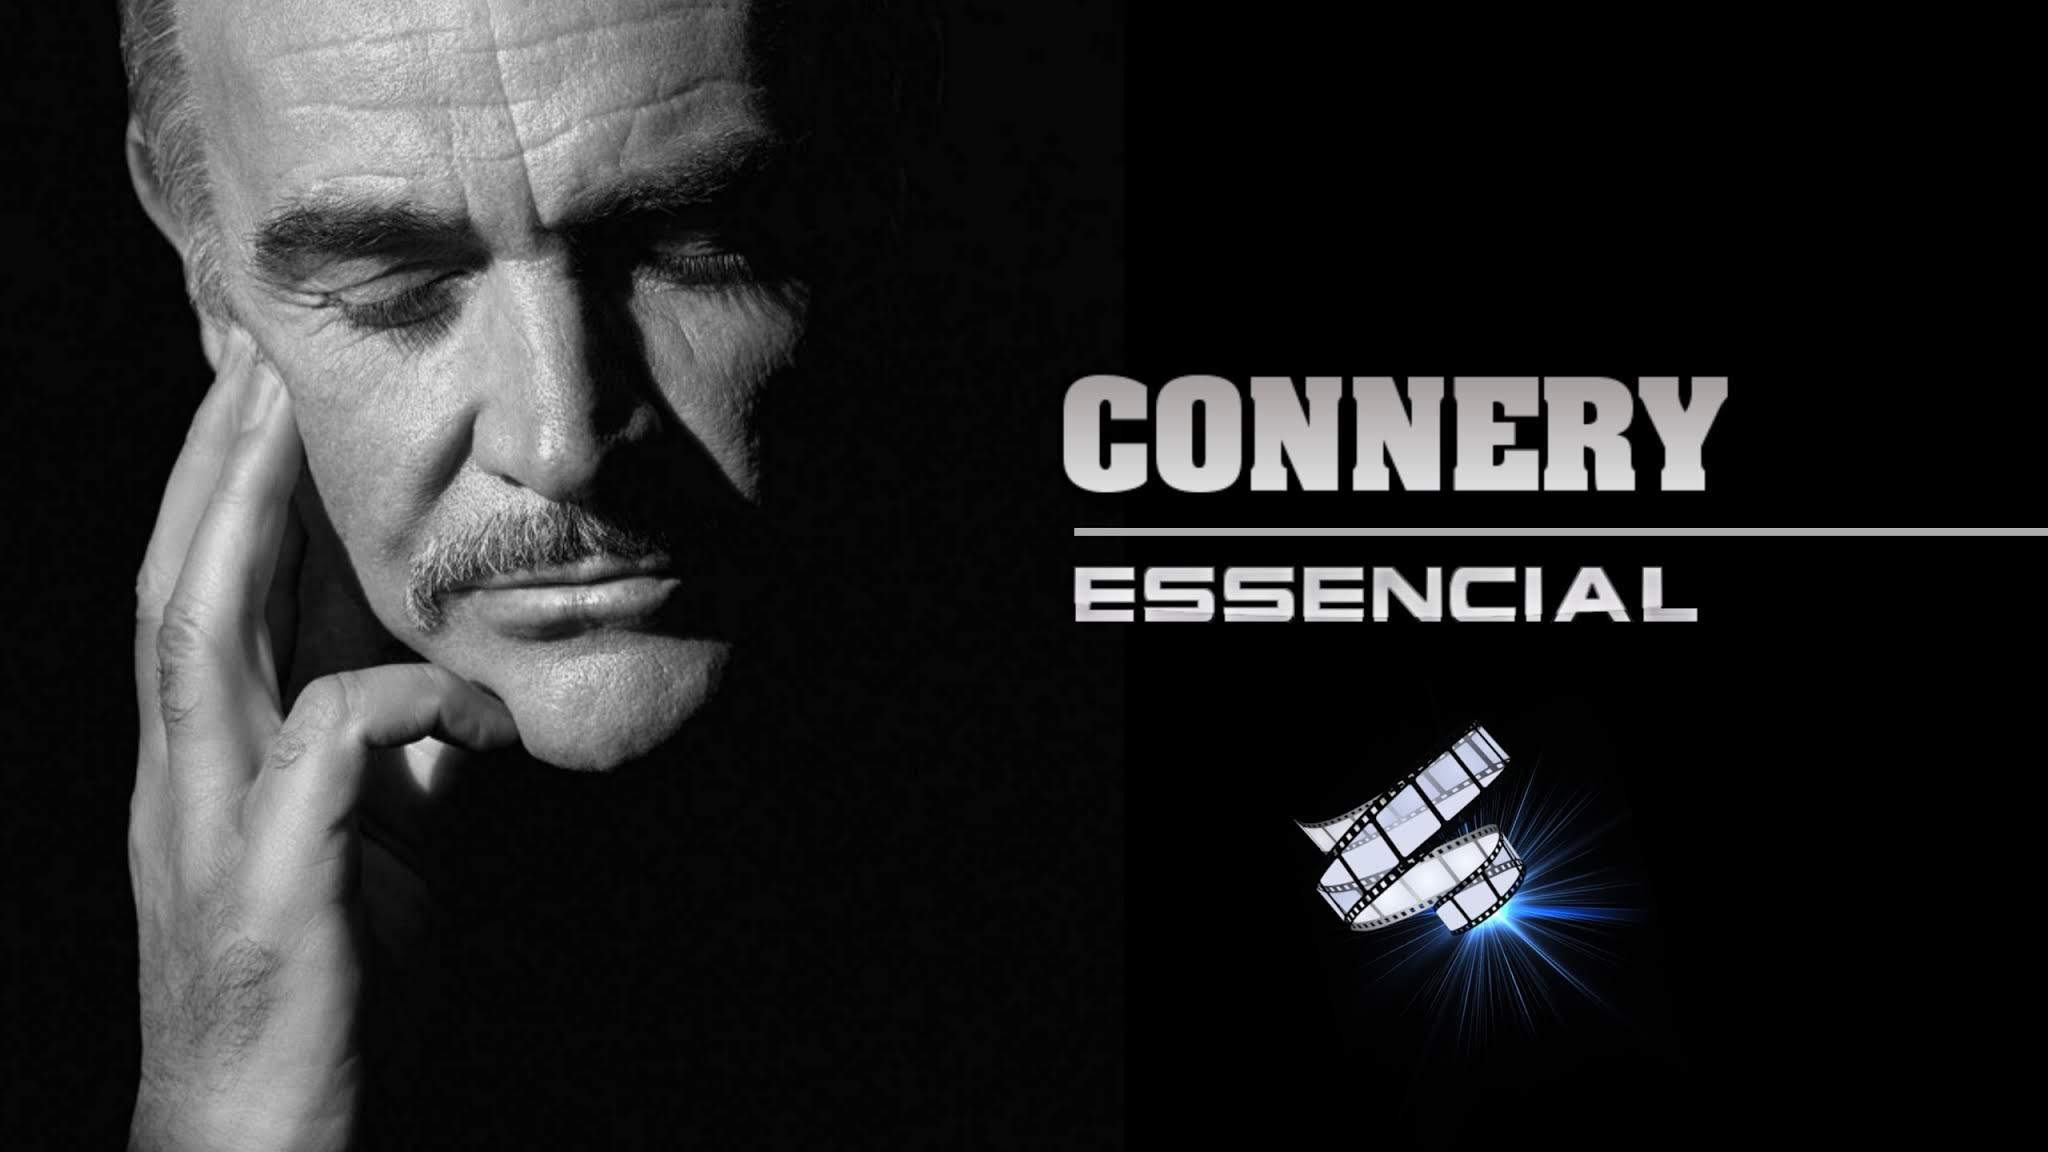 sean-connery-20-filmes-essenciais